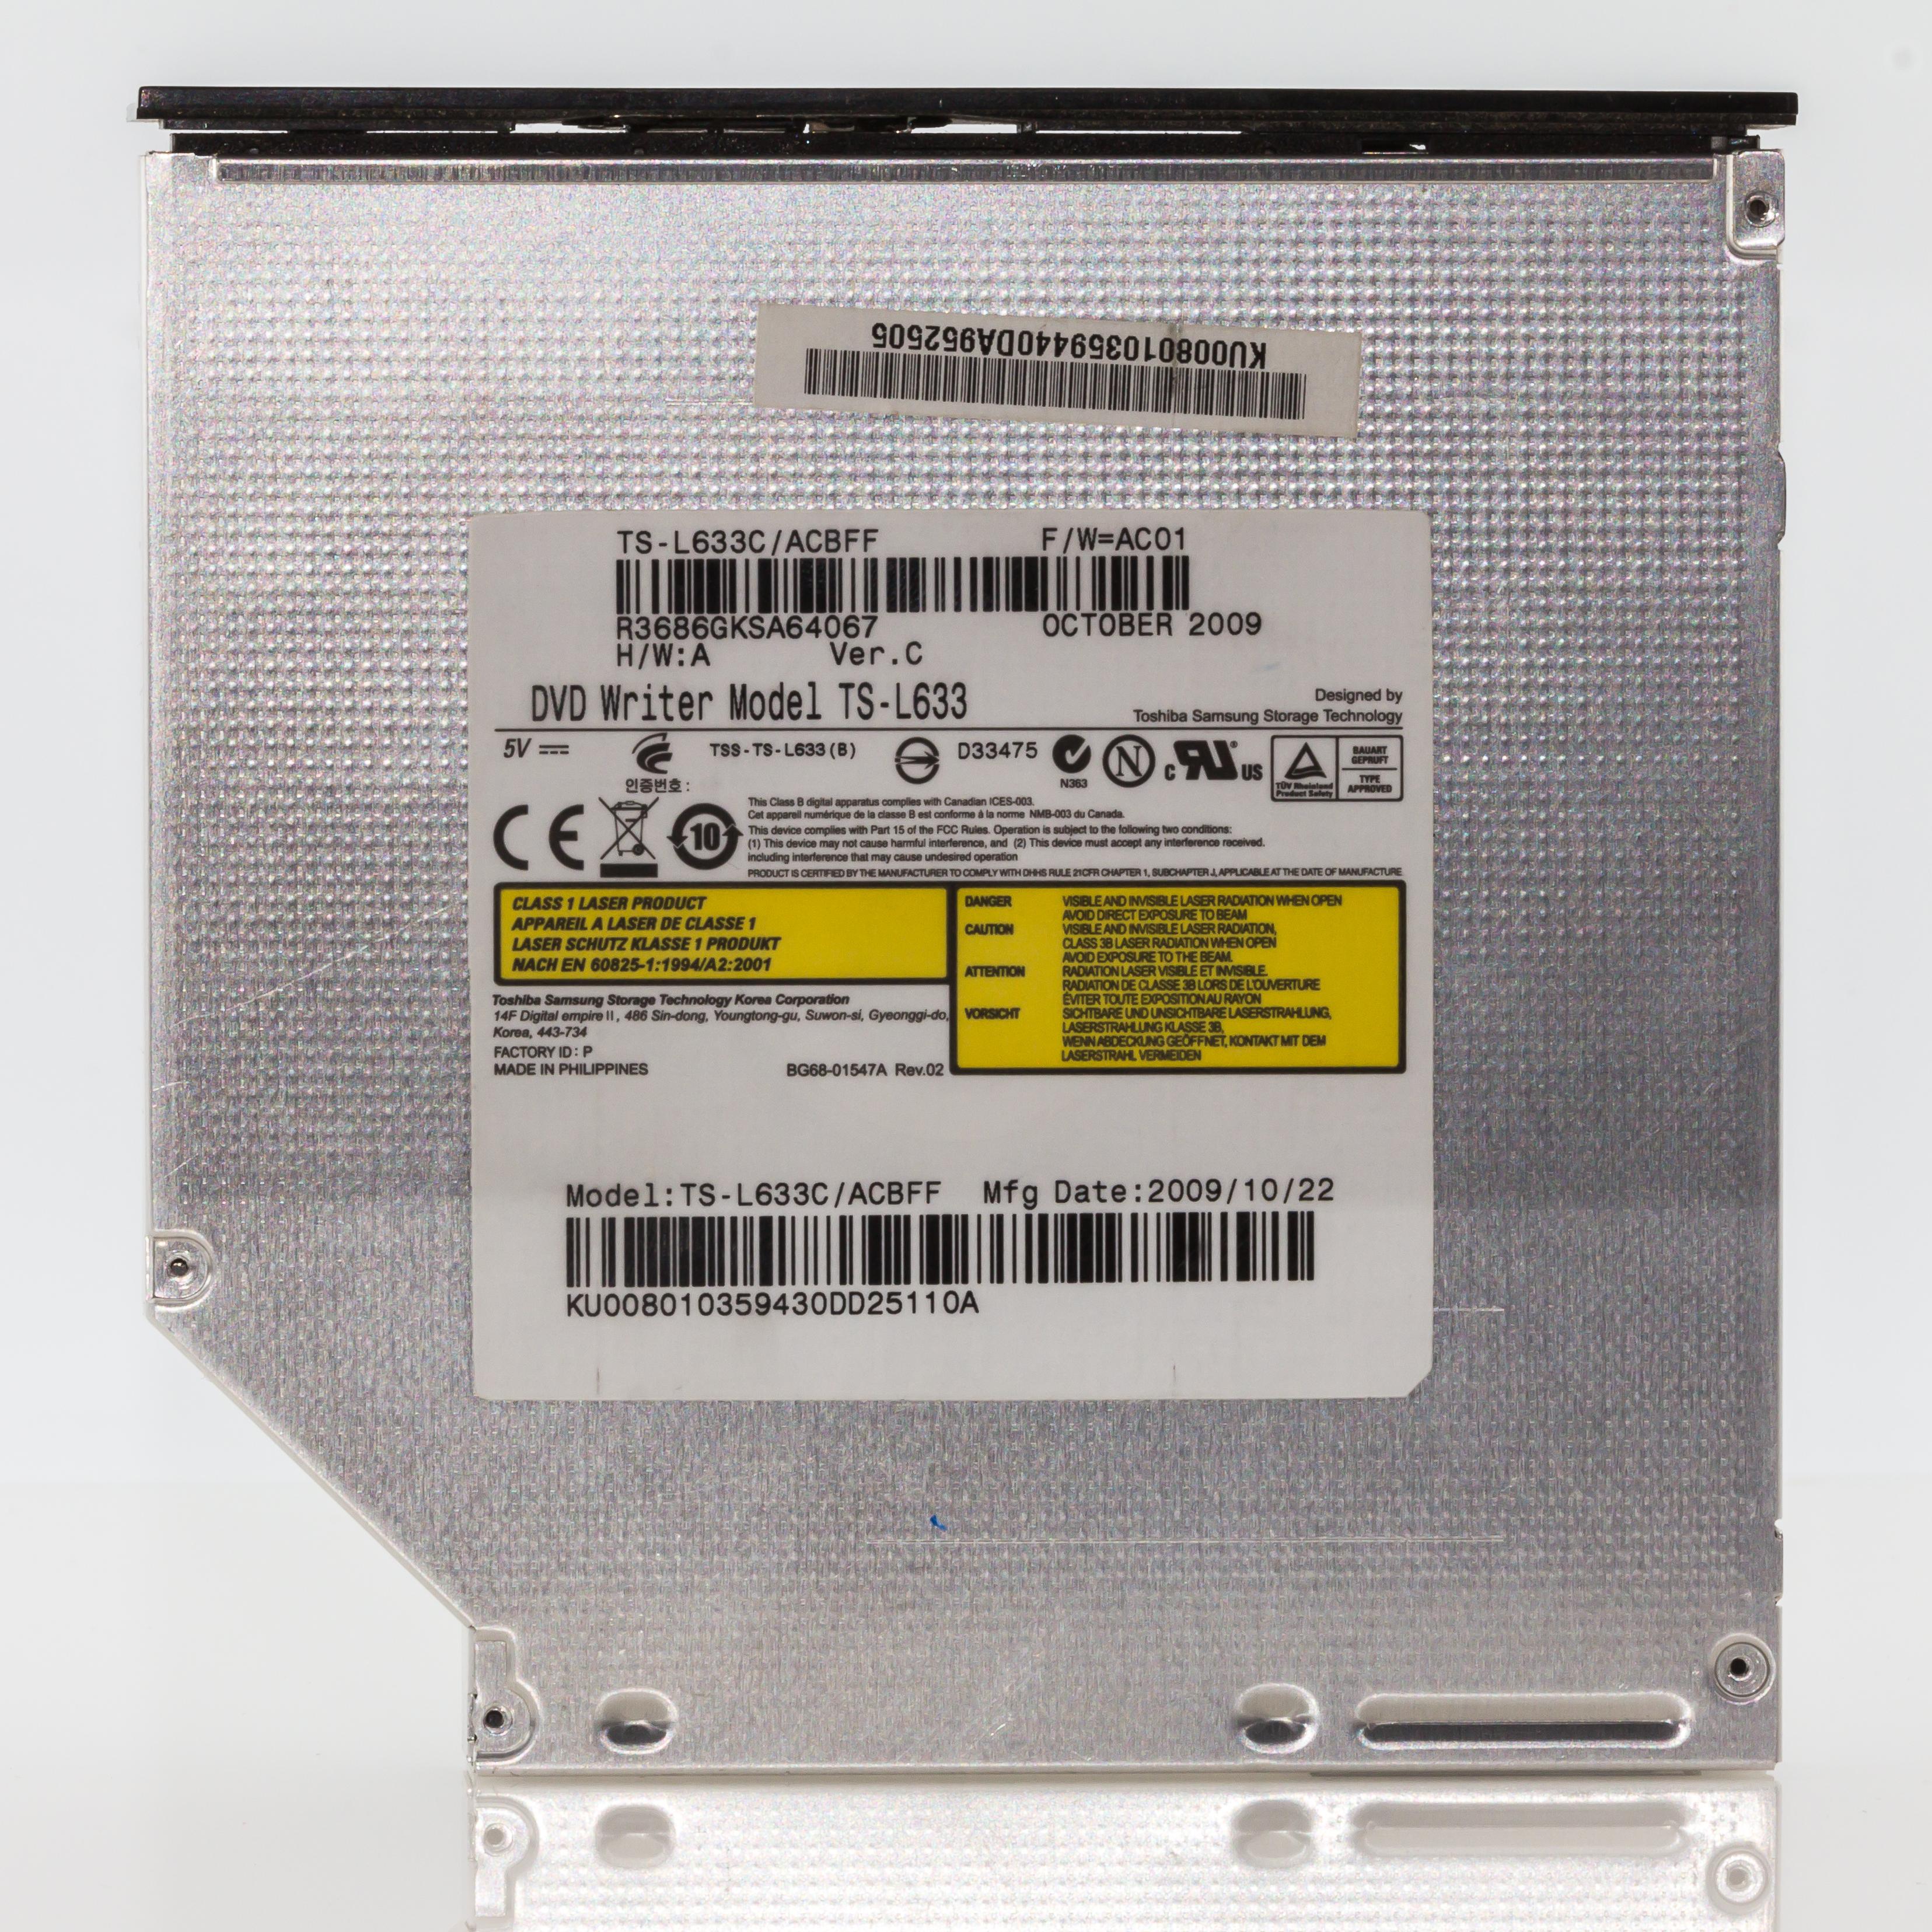 Datei DVD Writer TS L633 Toshiba Samsung Storage Technology 4605